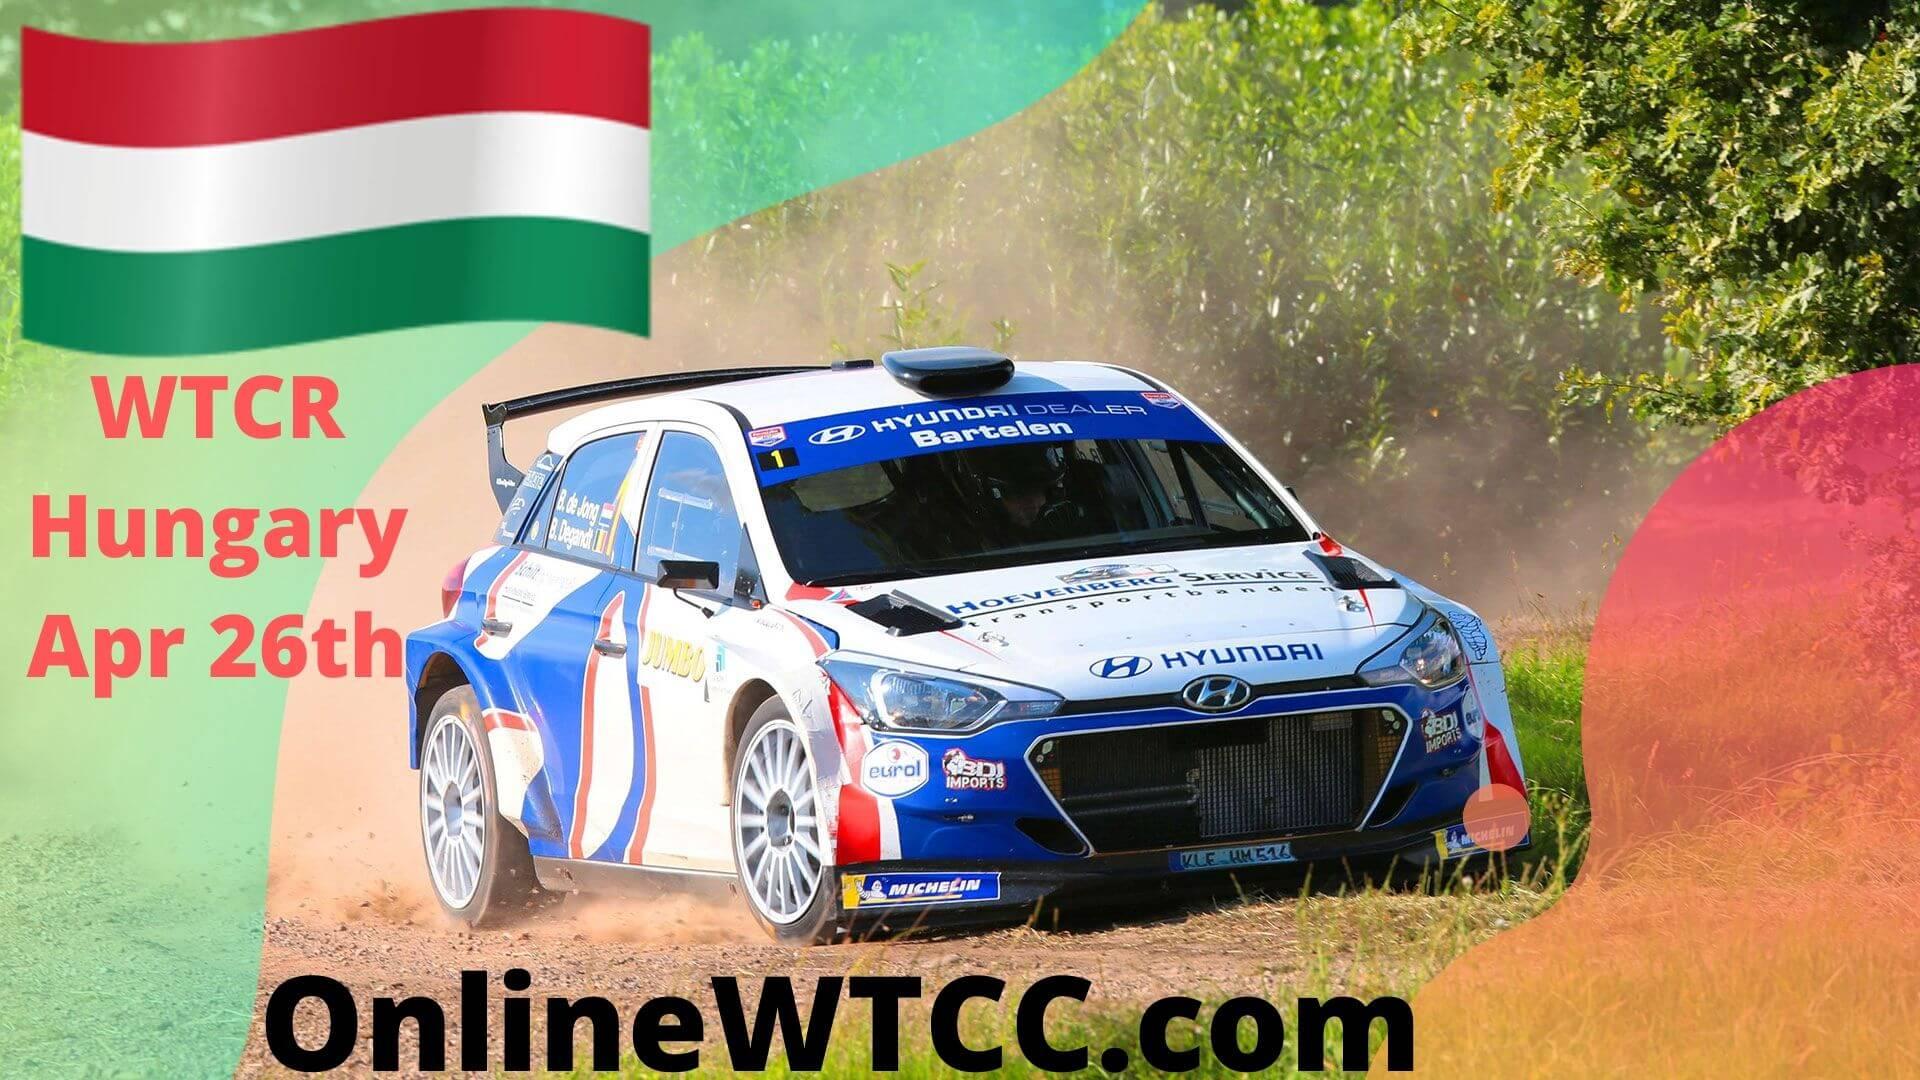 Hungary WTCR Live Stream 2020 | Hungaroring